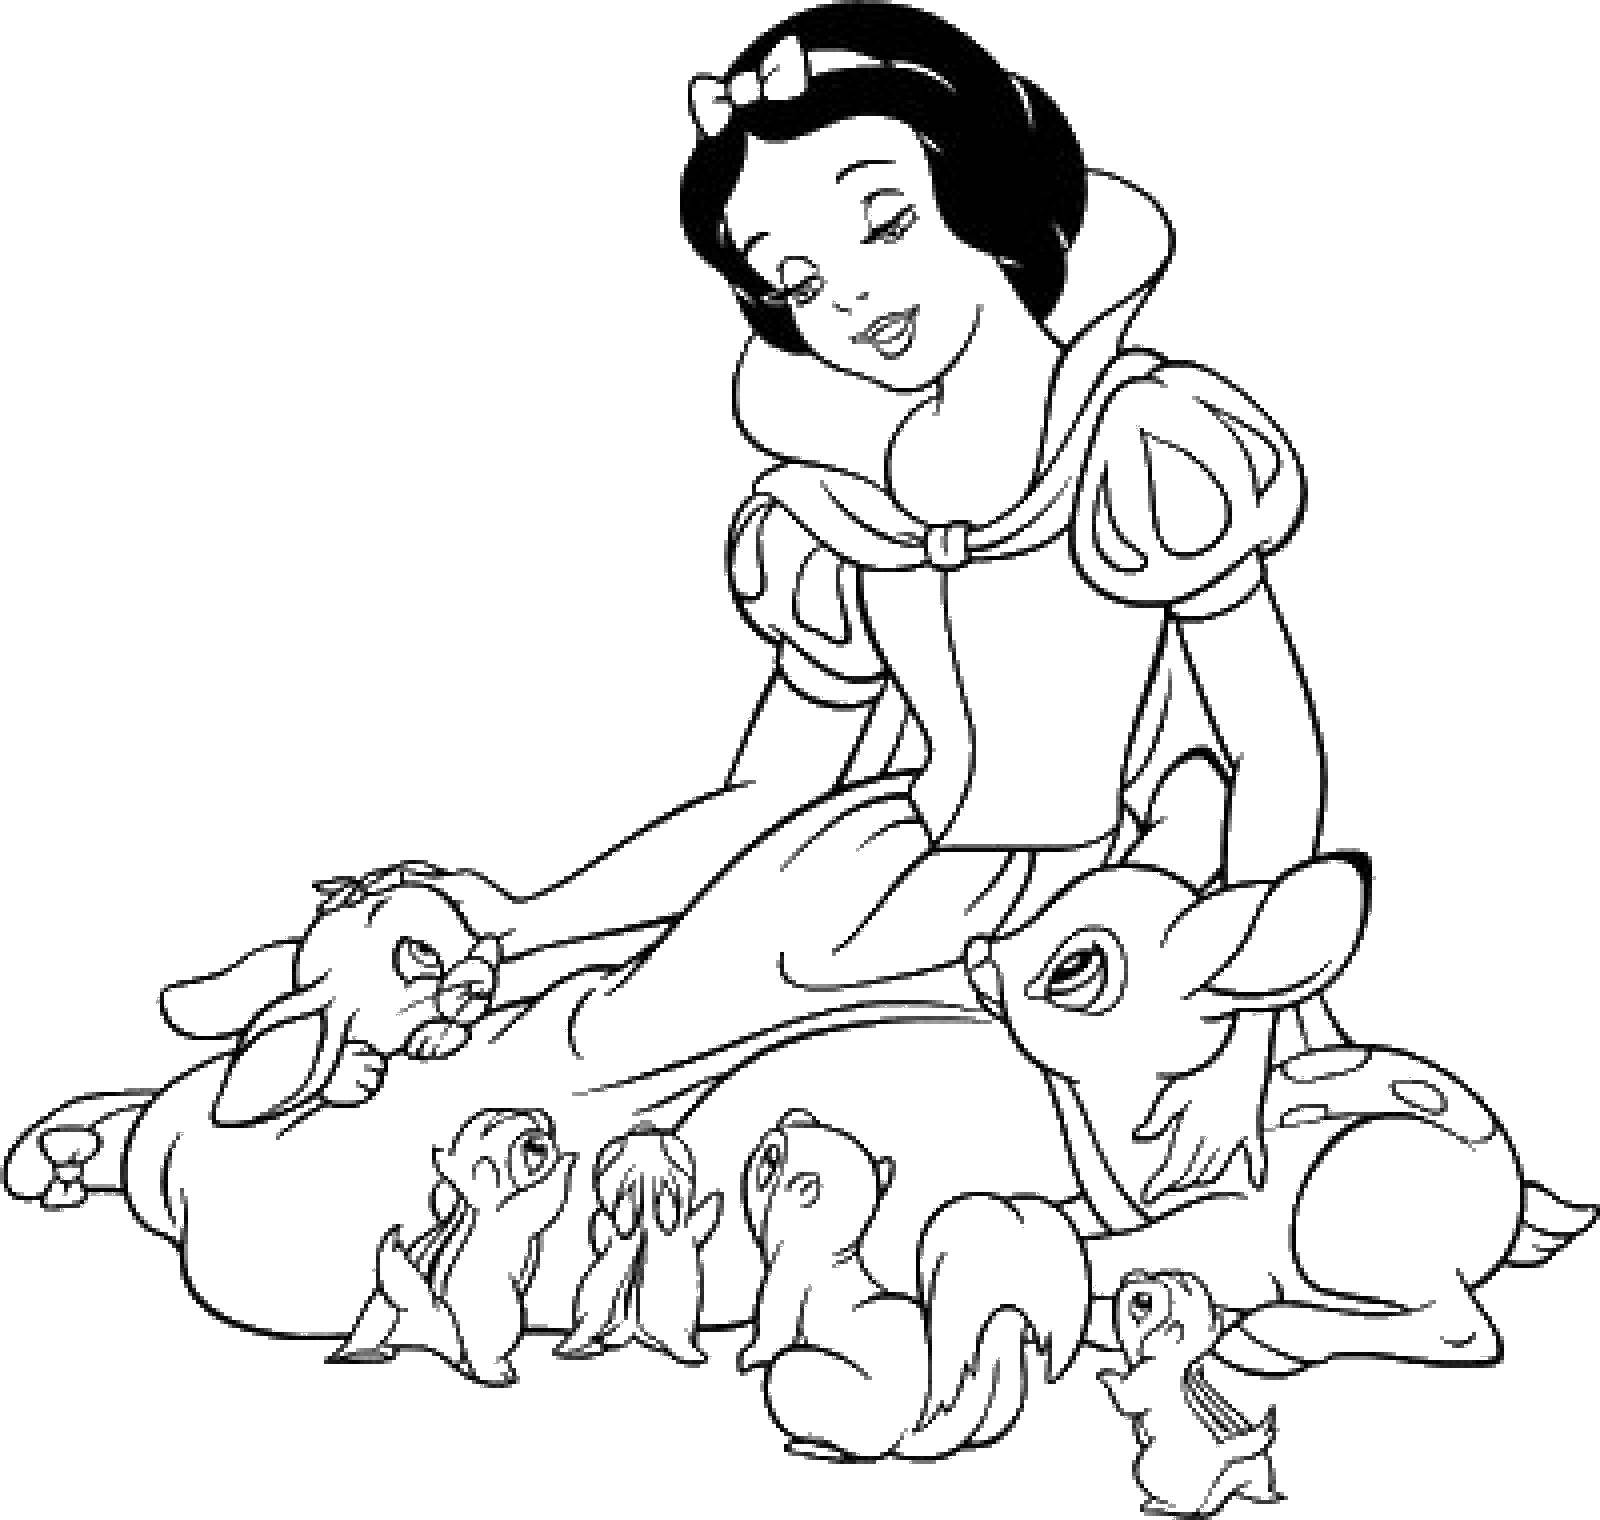 Coloring sheet snow white Download Togruta, star wars.  Print ,cartoons,